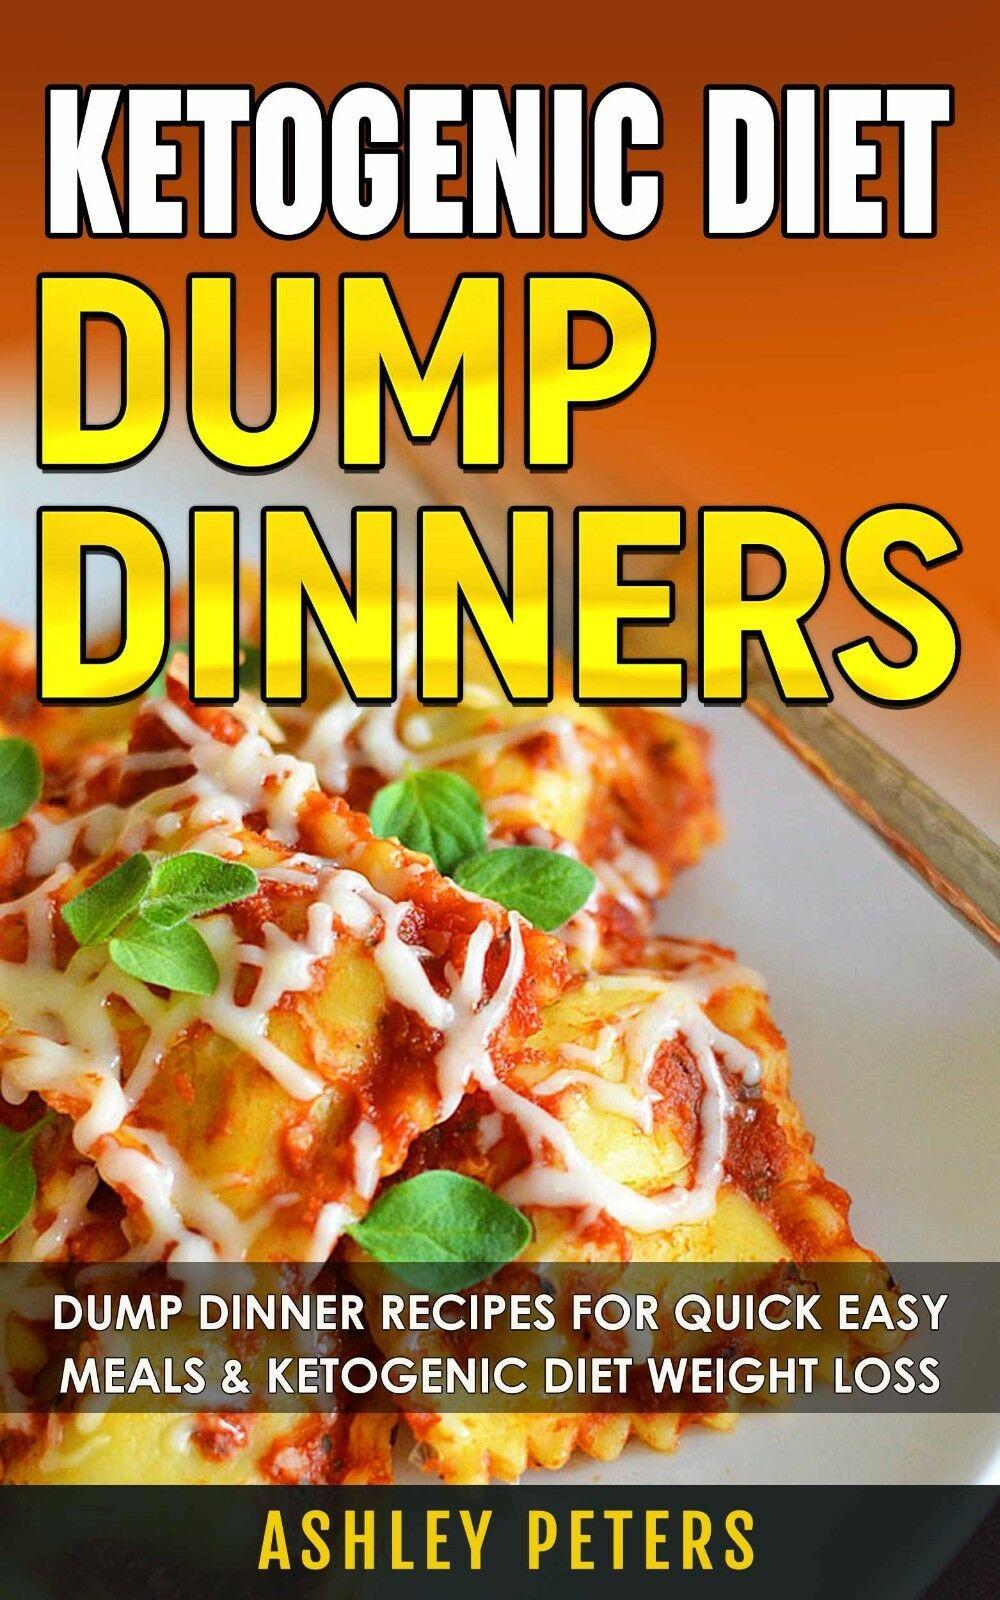 Keto Diet Recipes Free  Ketogenic Recipes Book